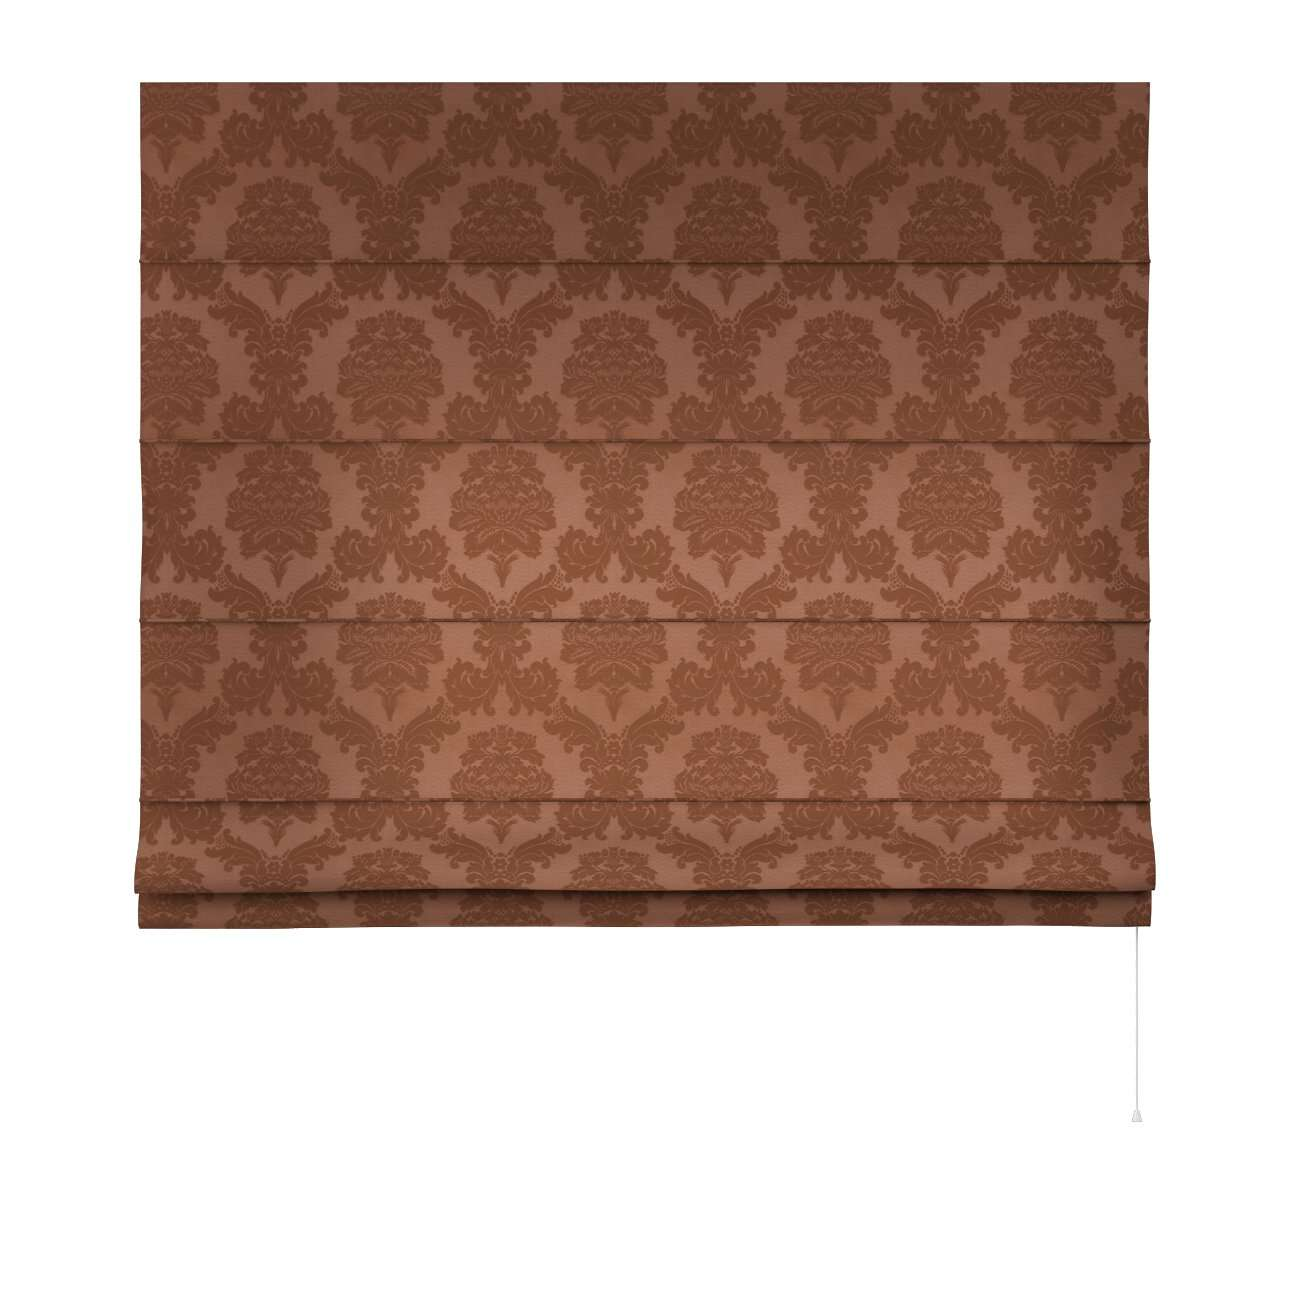 Capri roman blind 80 x 170 cm (31.5 x 67 inch) in collection Damasco, fabric: 613-88